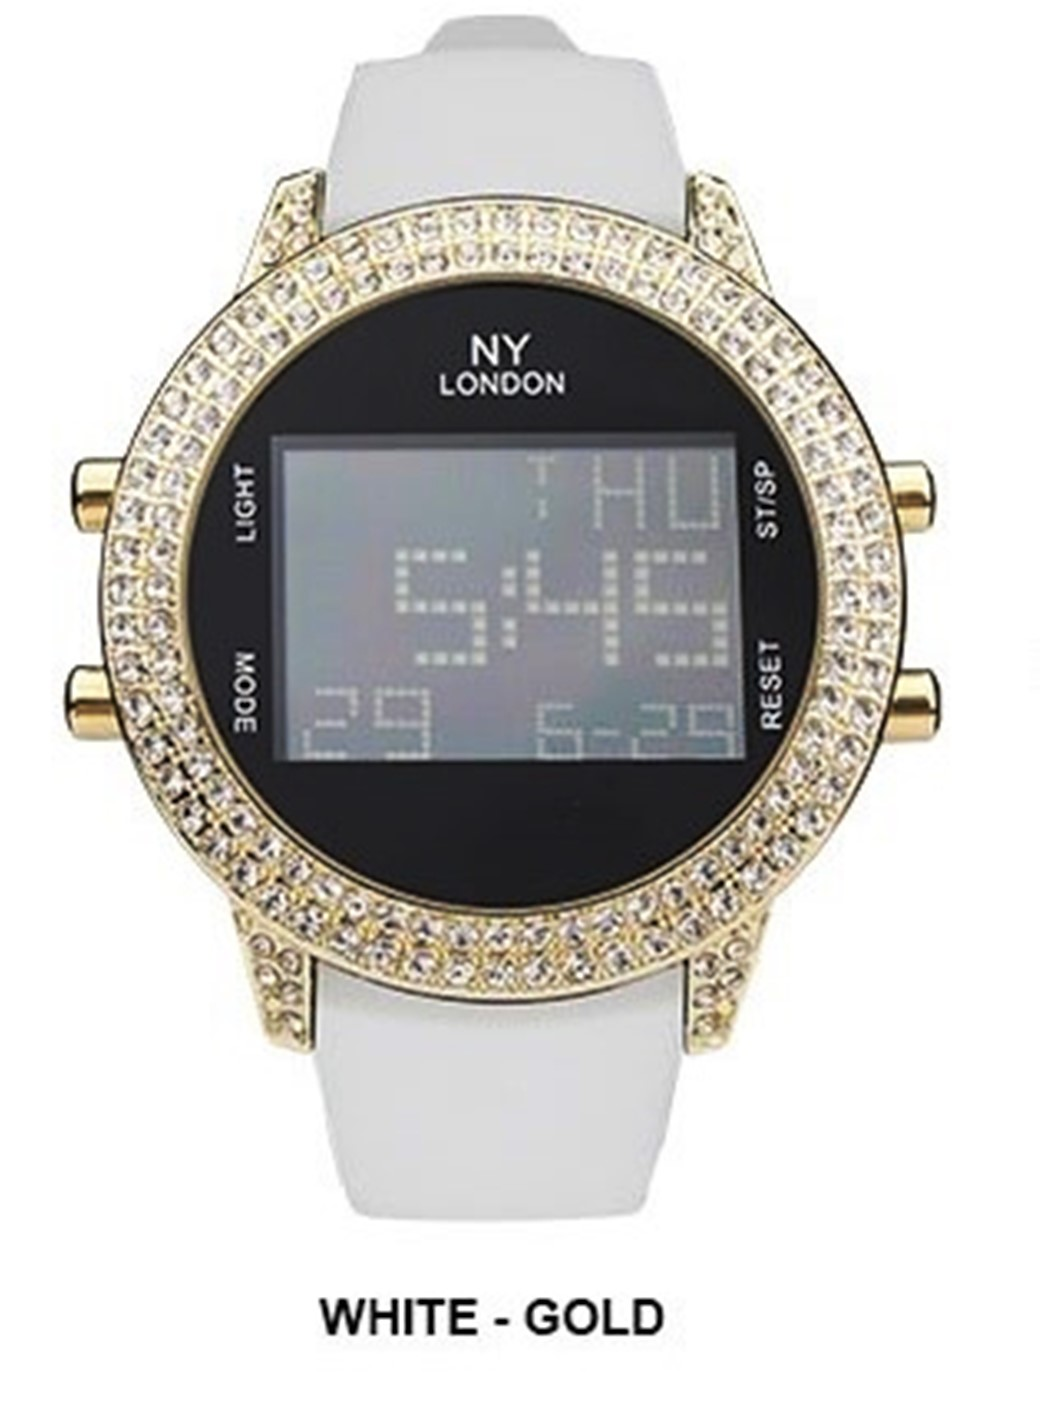 NY London Digital CZ Dial with Fancy Band Watch